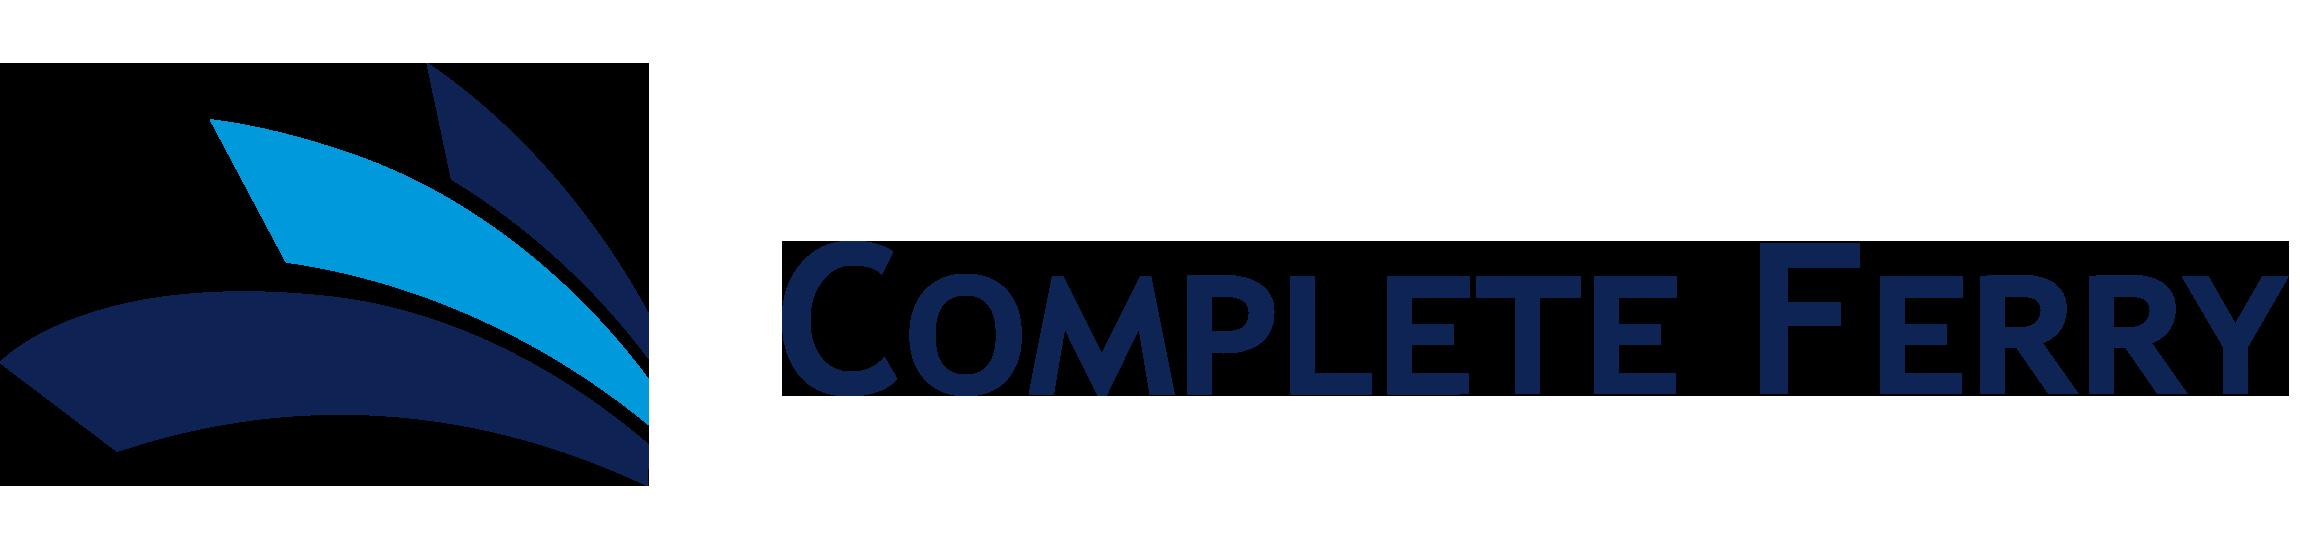 Complete Ferry รับดูแลเพจ และการตลาดออนไลน์ แบบครบวงจร